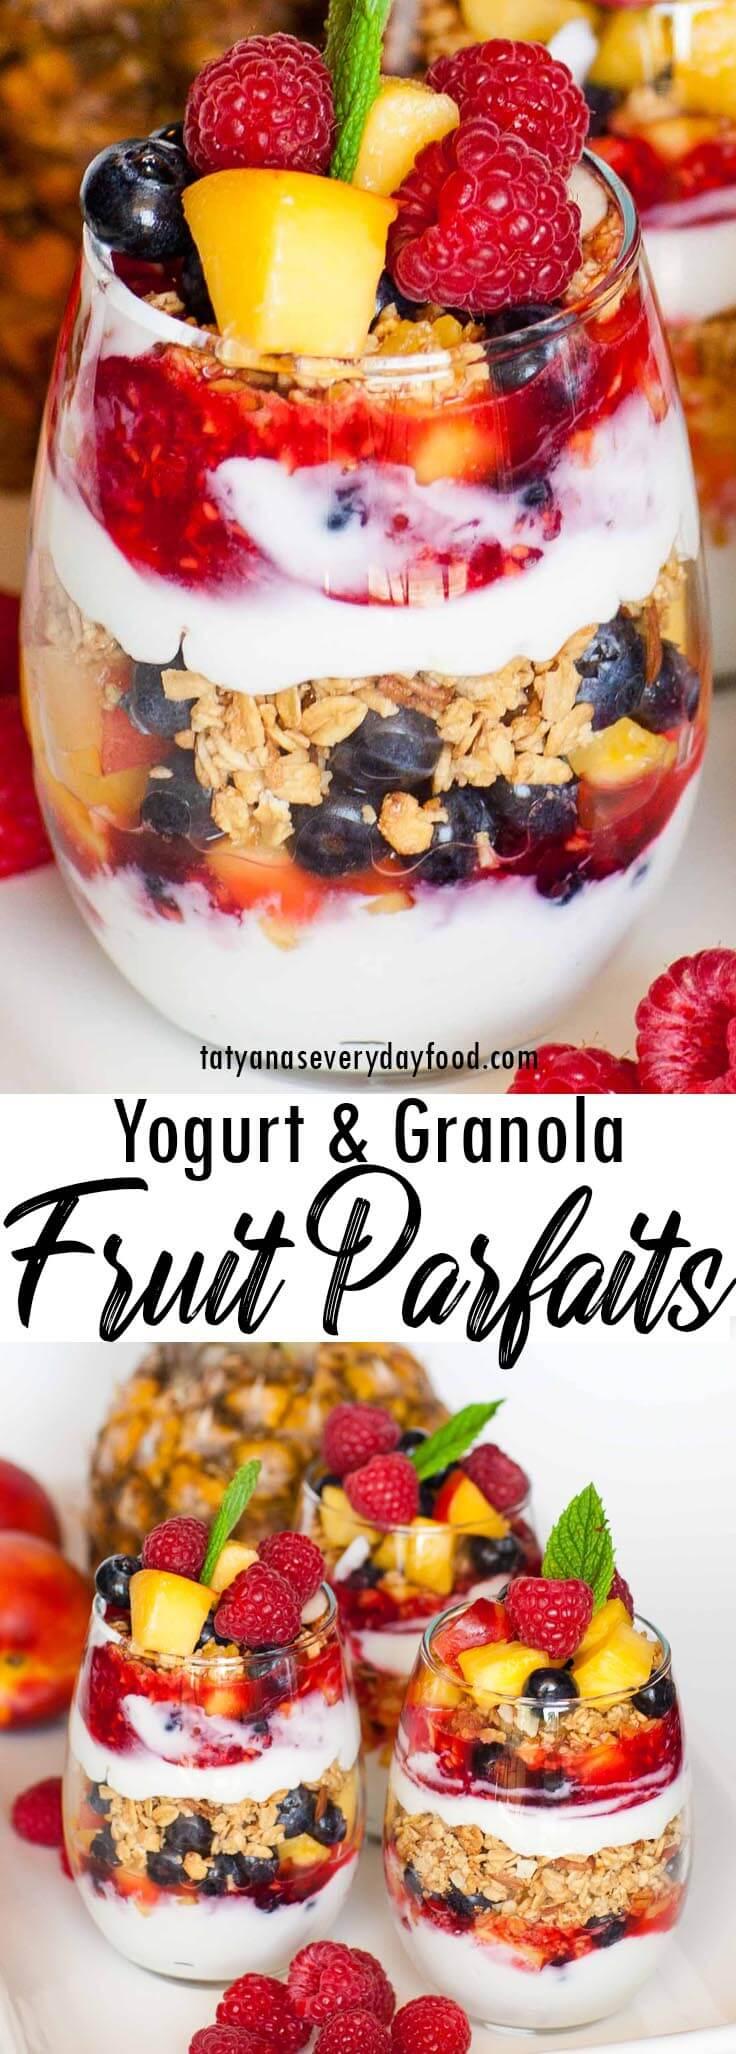 Yogurt & Granola Fruit Parfait video recipe